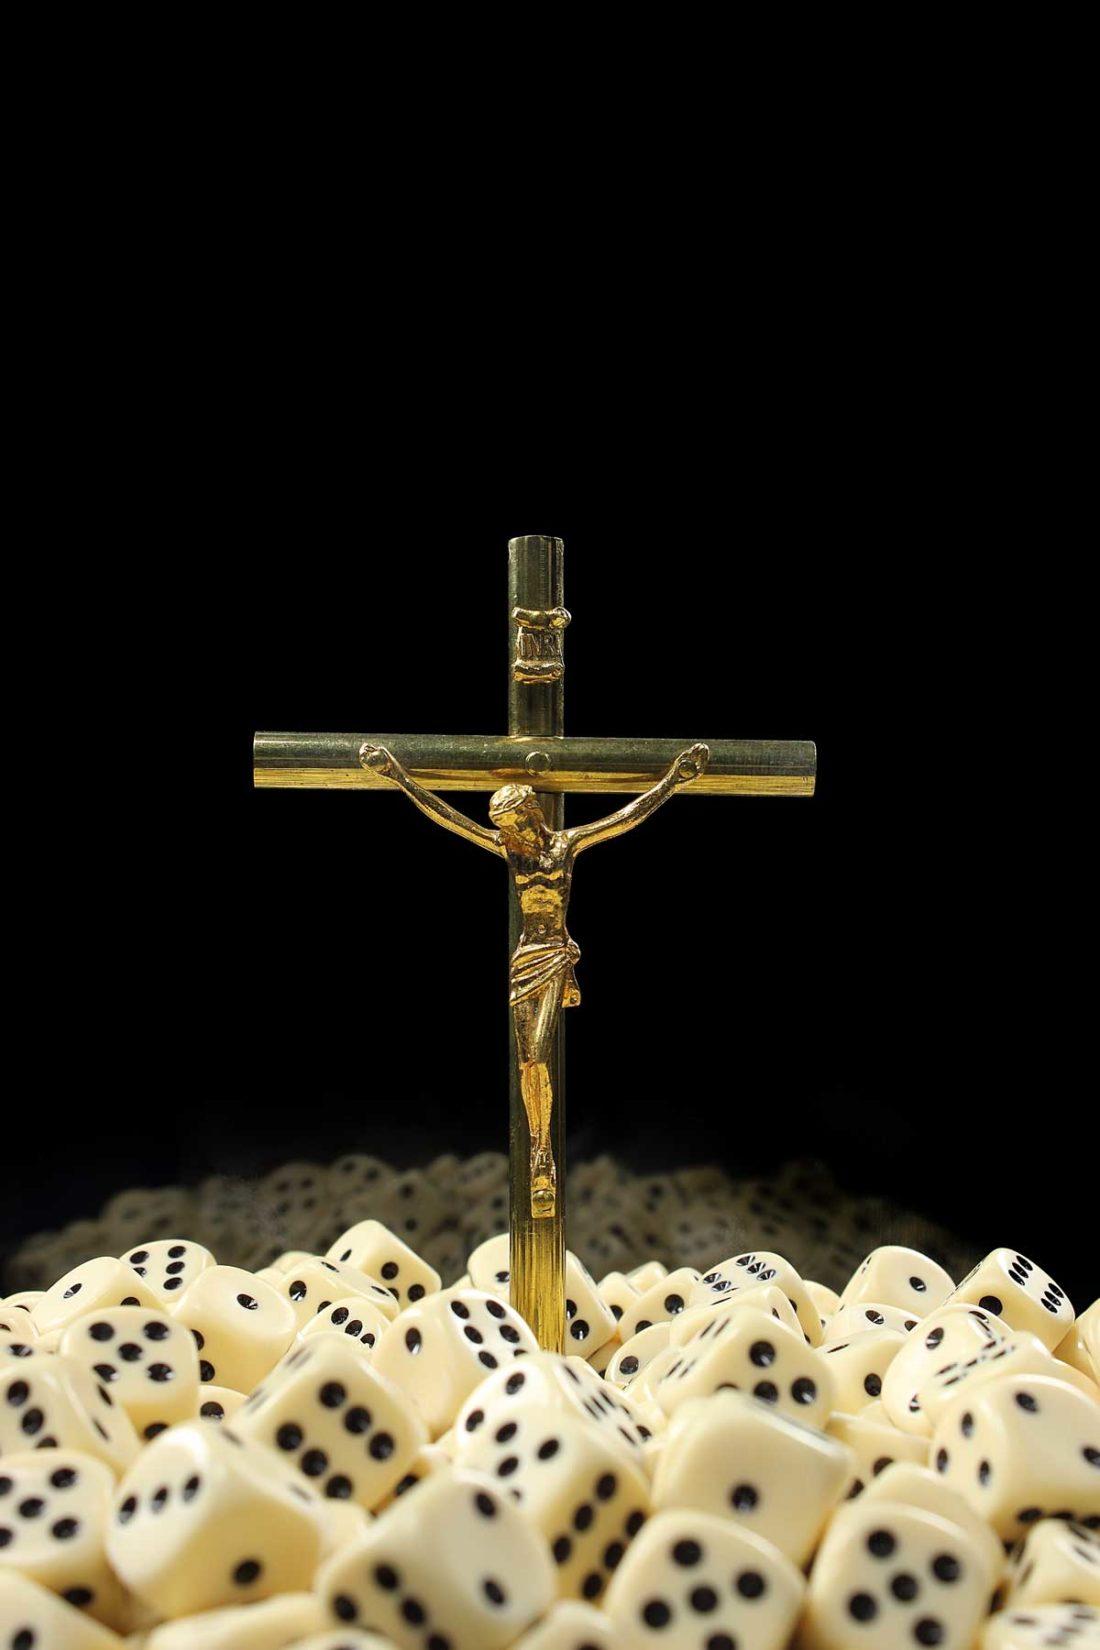 detail artwork crucifix - dice created by meimorettini duo italian artists